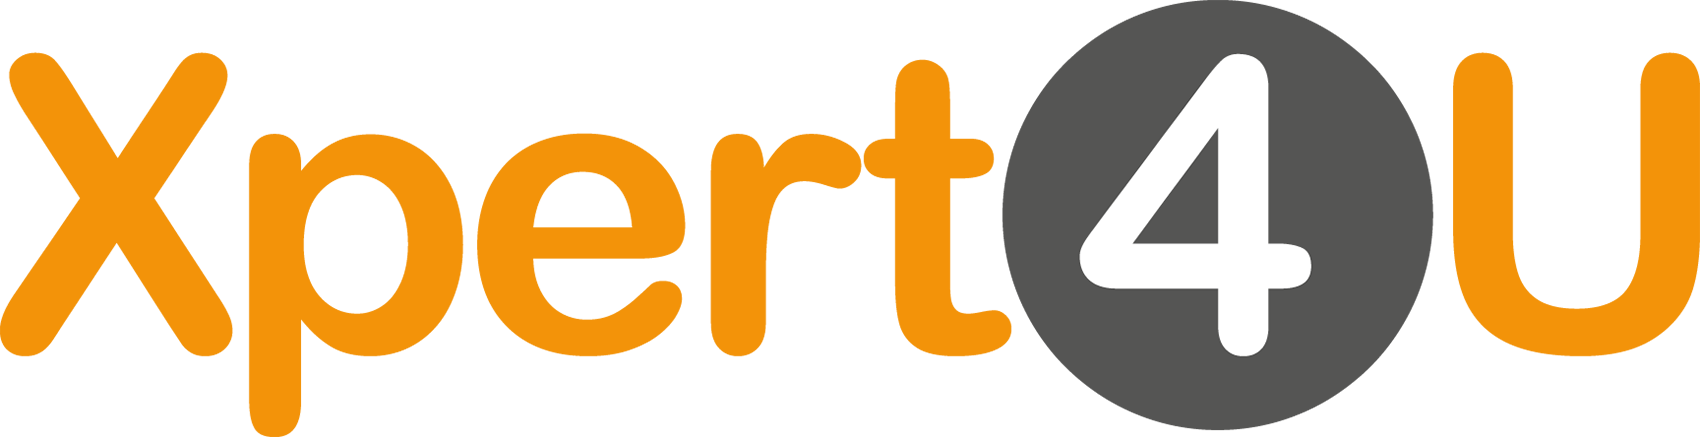 xpert4u